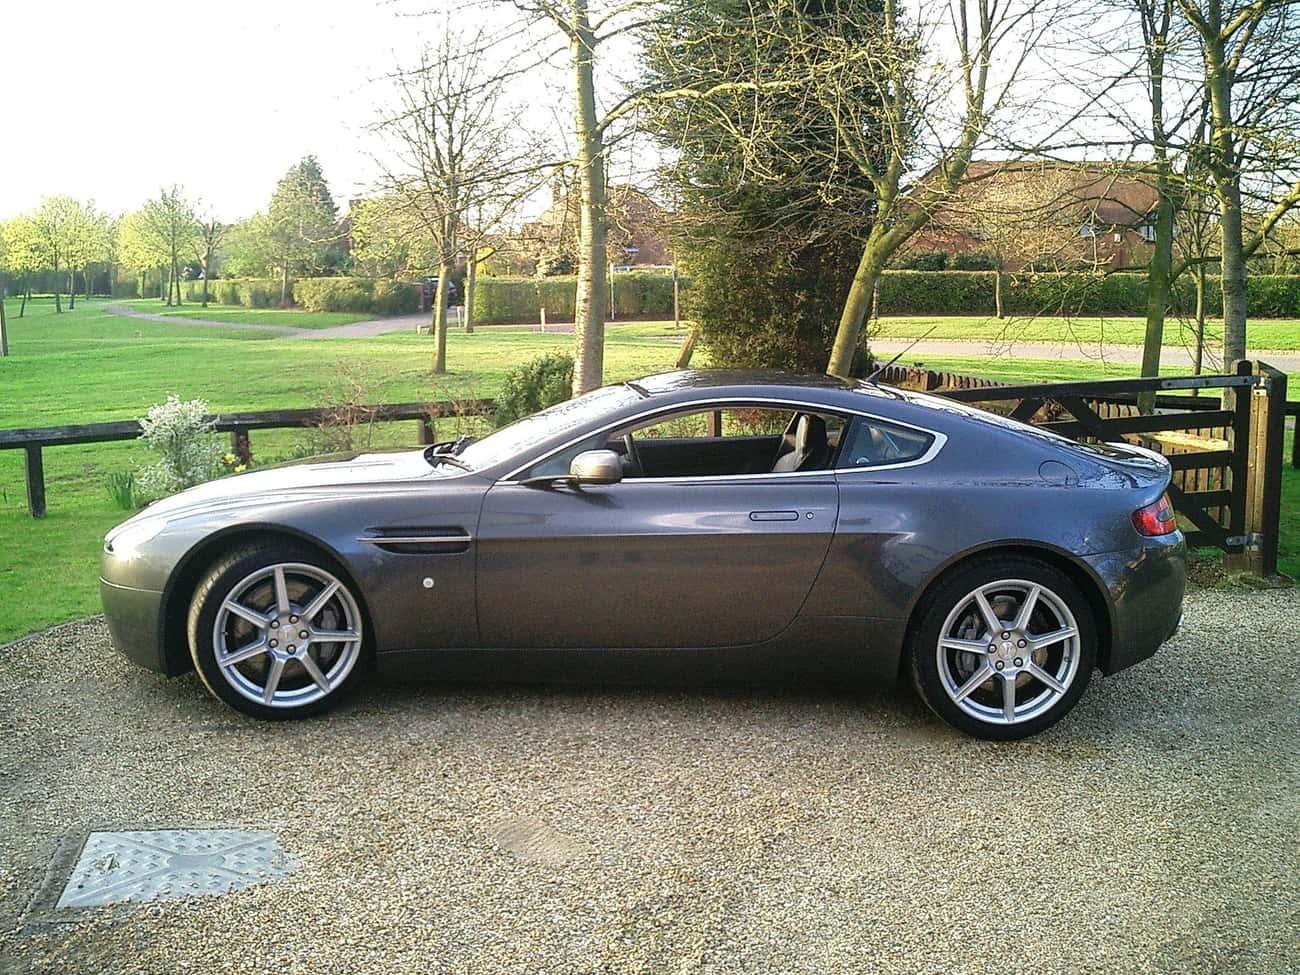 Aston Martin V8 Vantage (2005) is listed (or ranked) 4 on the list Full List of Aston Martin Models